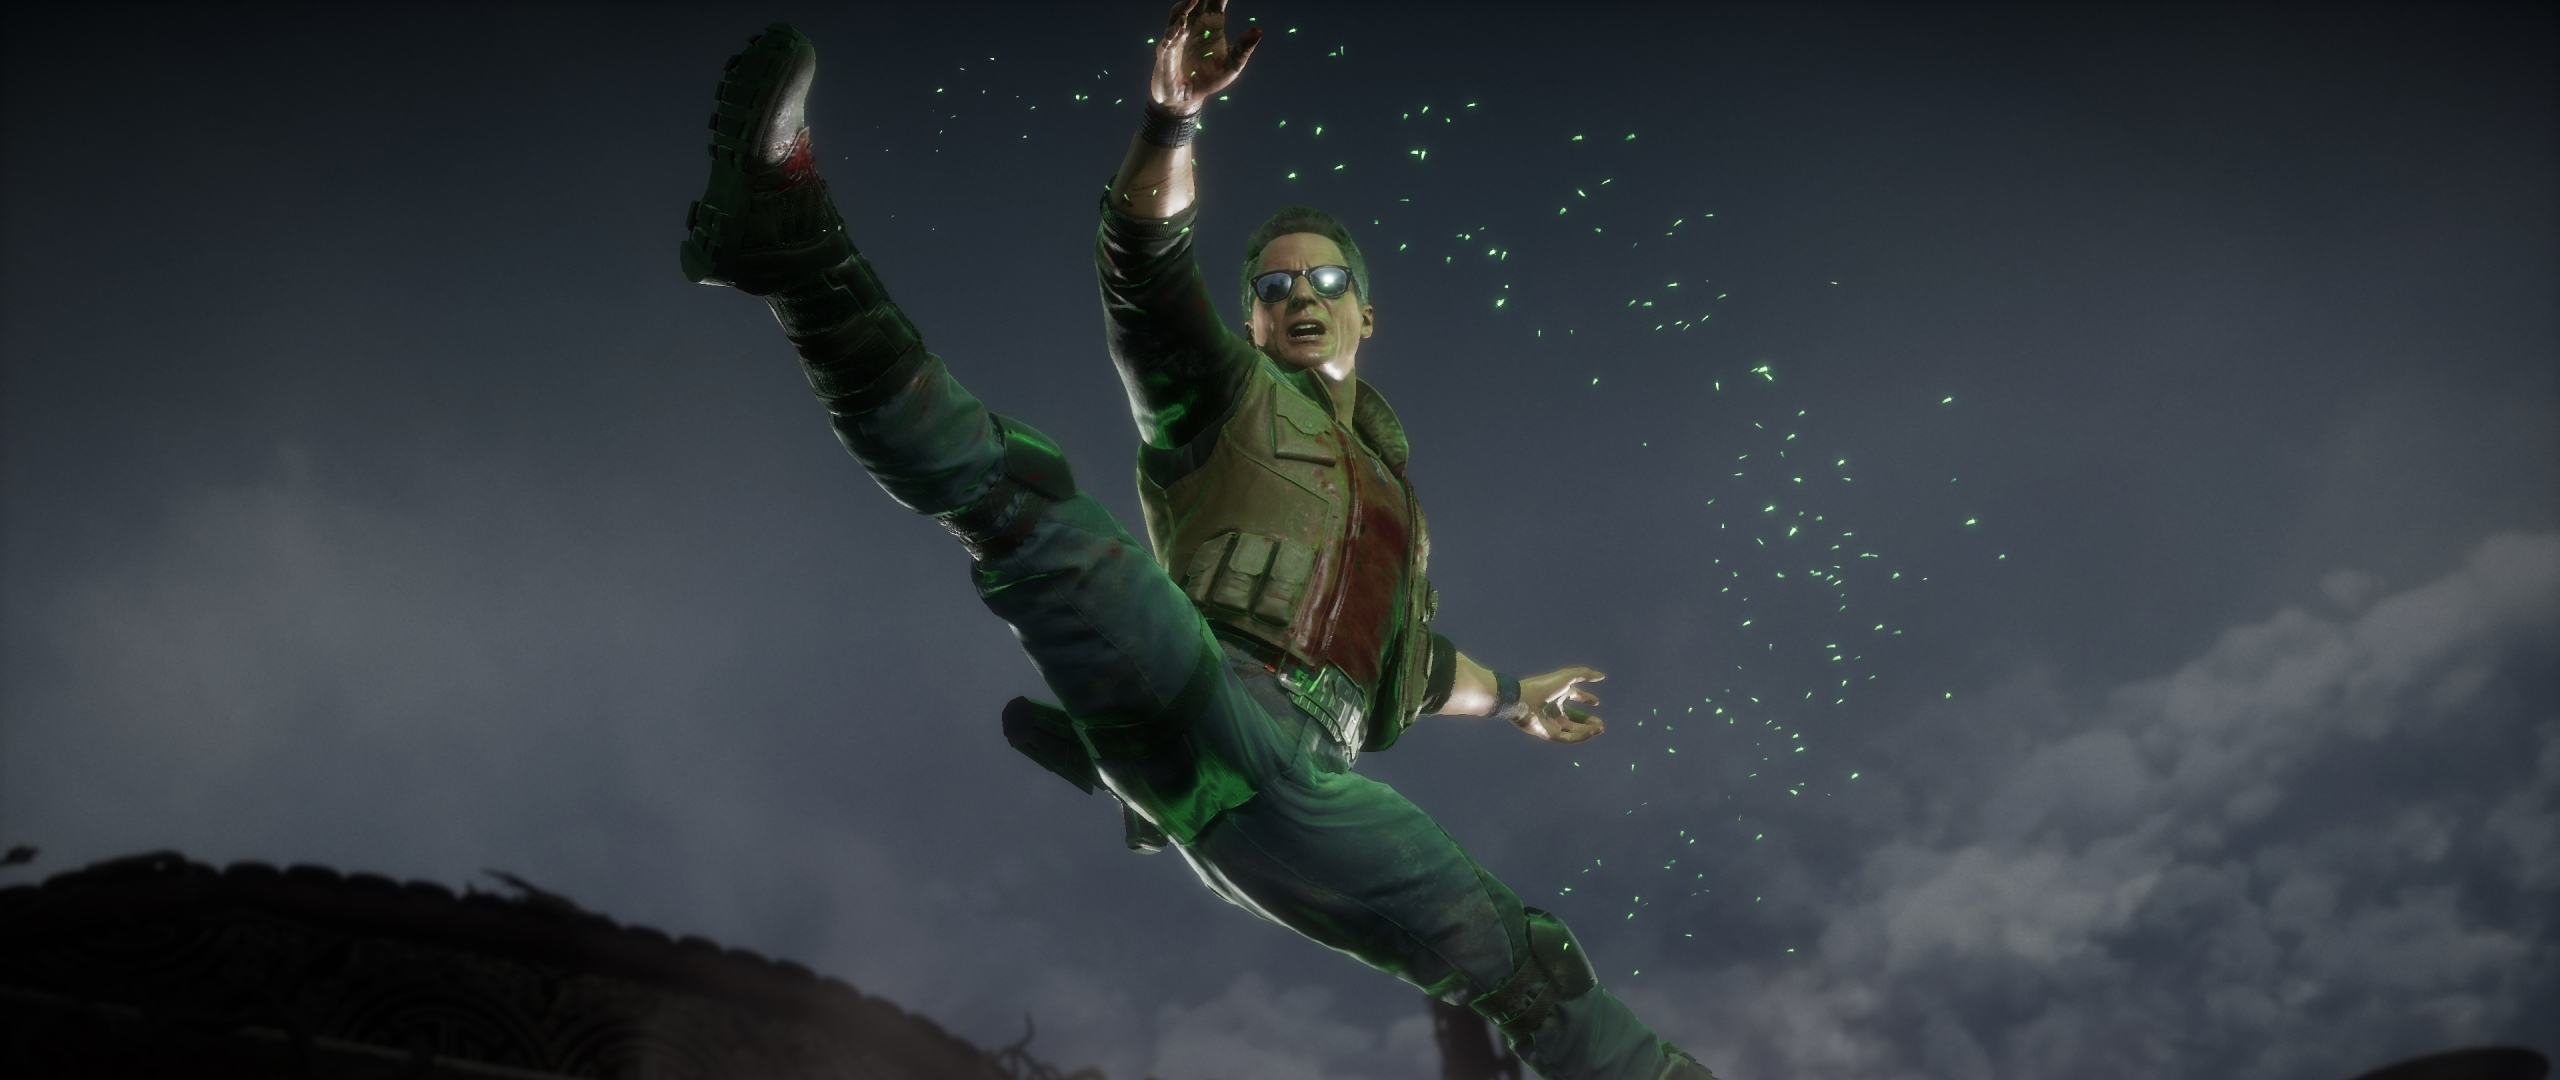 2560x1080 Johnny Cage Mortal Kombat 11 2560x1080